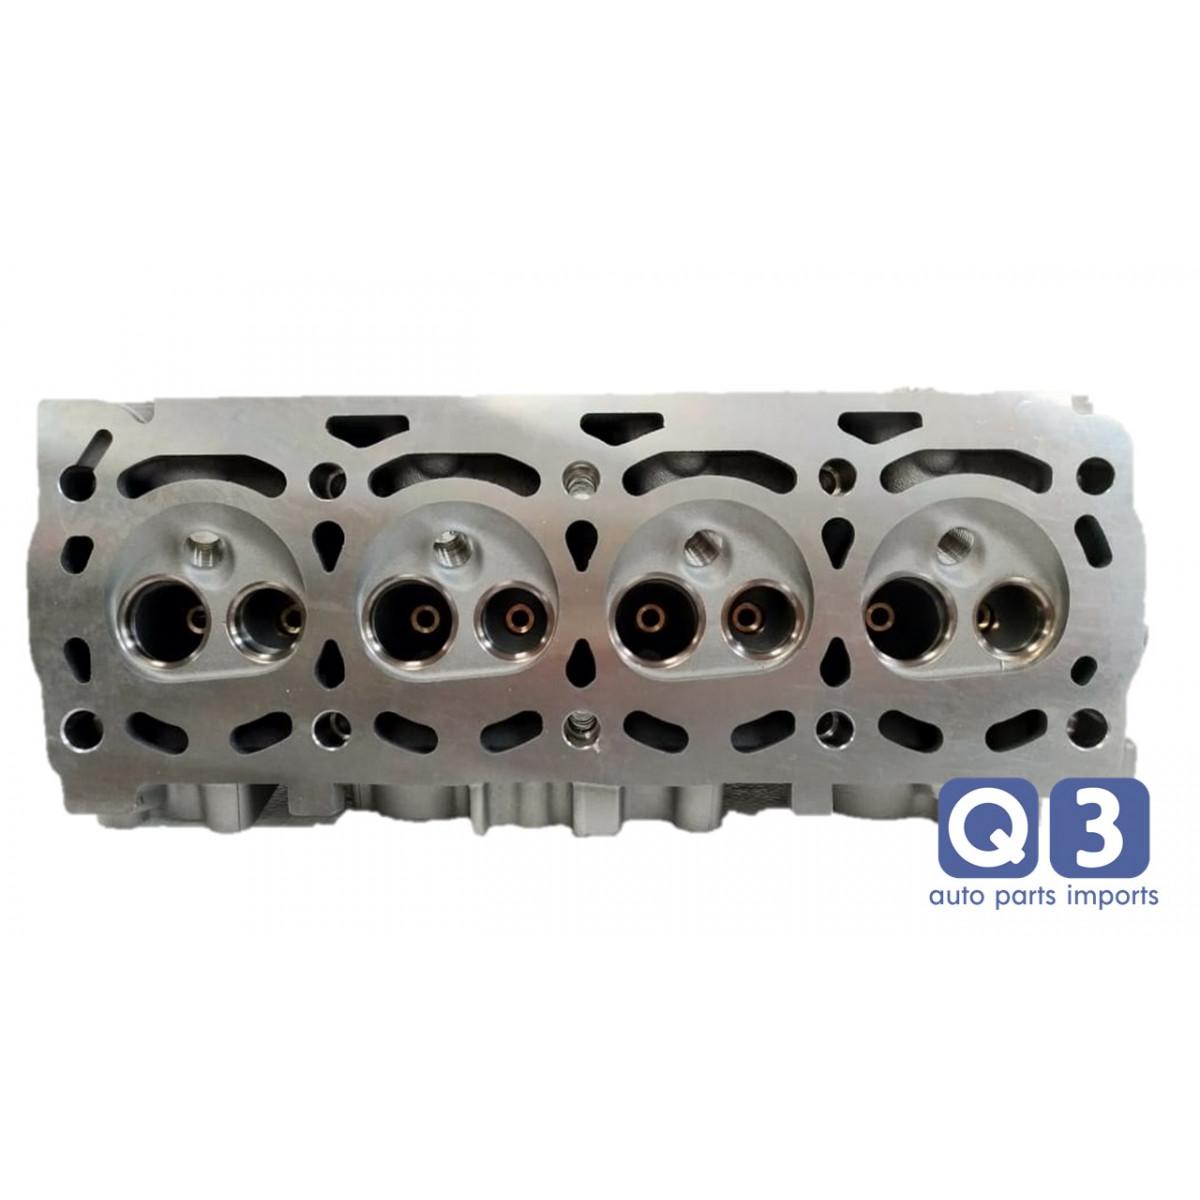 Cabeçote Volkswagen Fox 1.6 8V Motor Power Novo